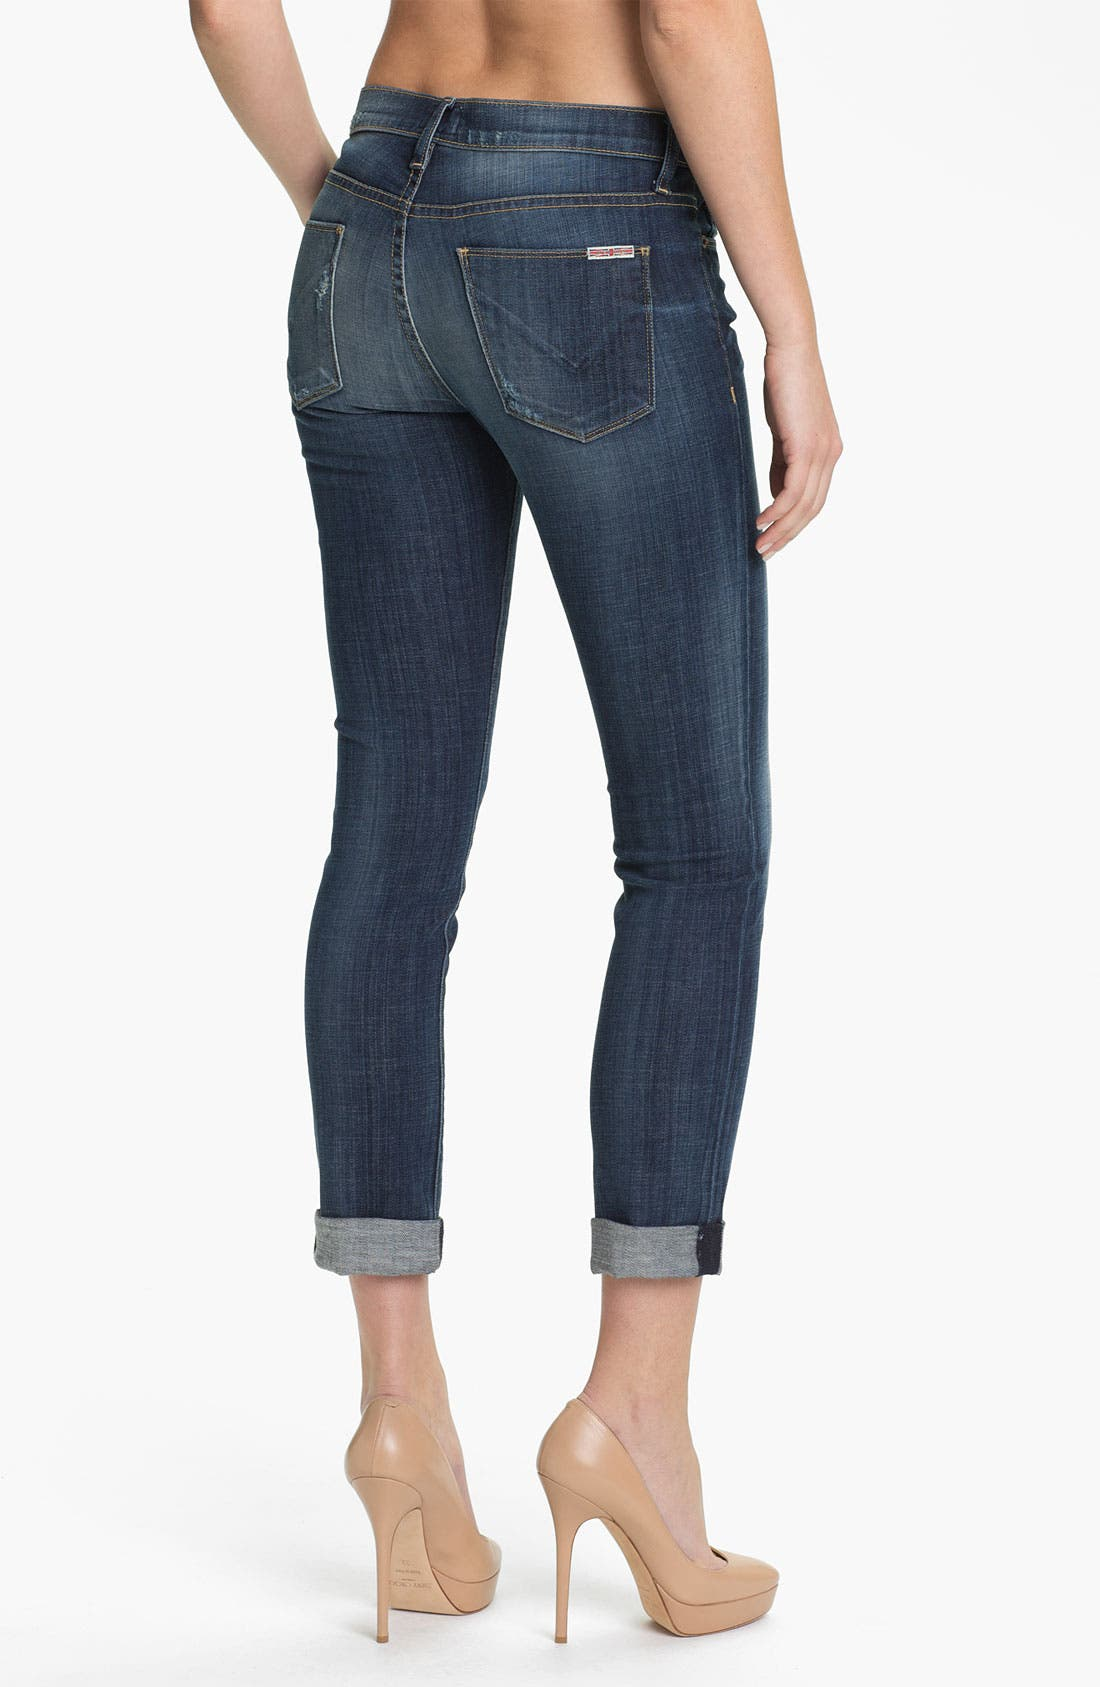 Alternate Image 2  - Hudson Jeans 'Tilda' Cuffed Straight Leg Stretch Jeans (Blue)